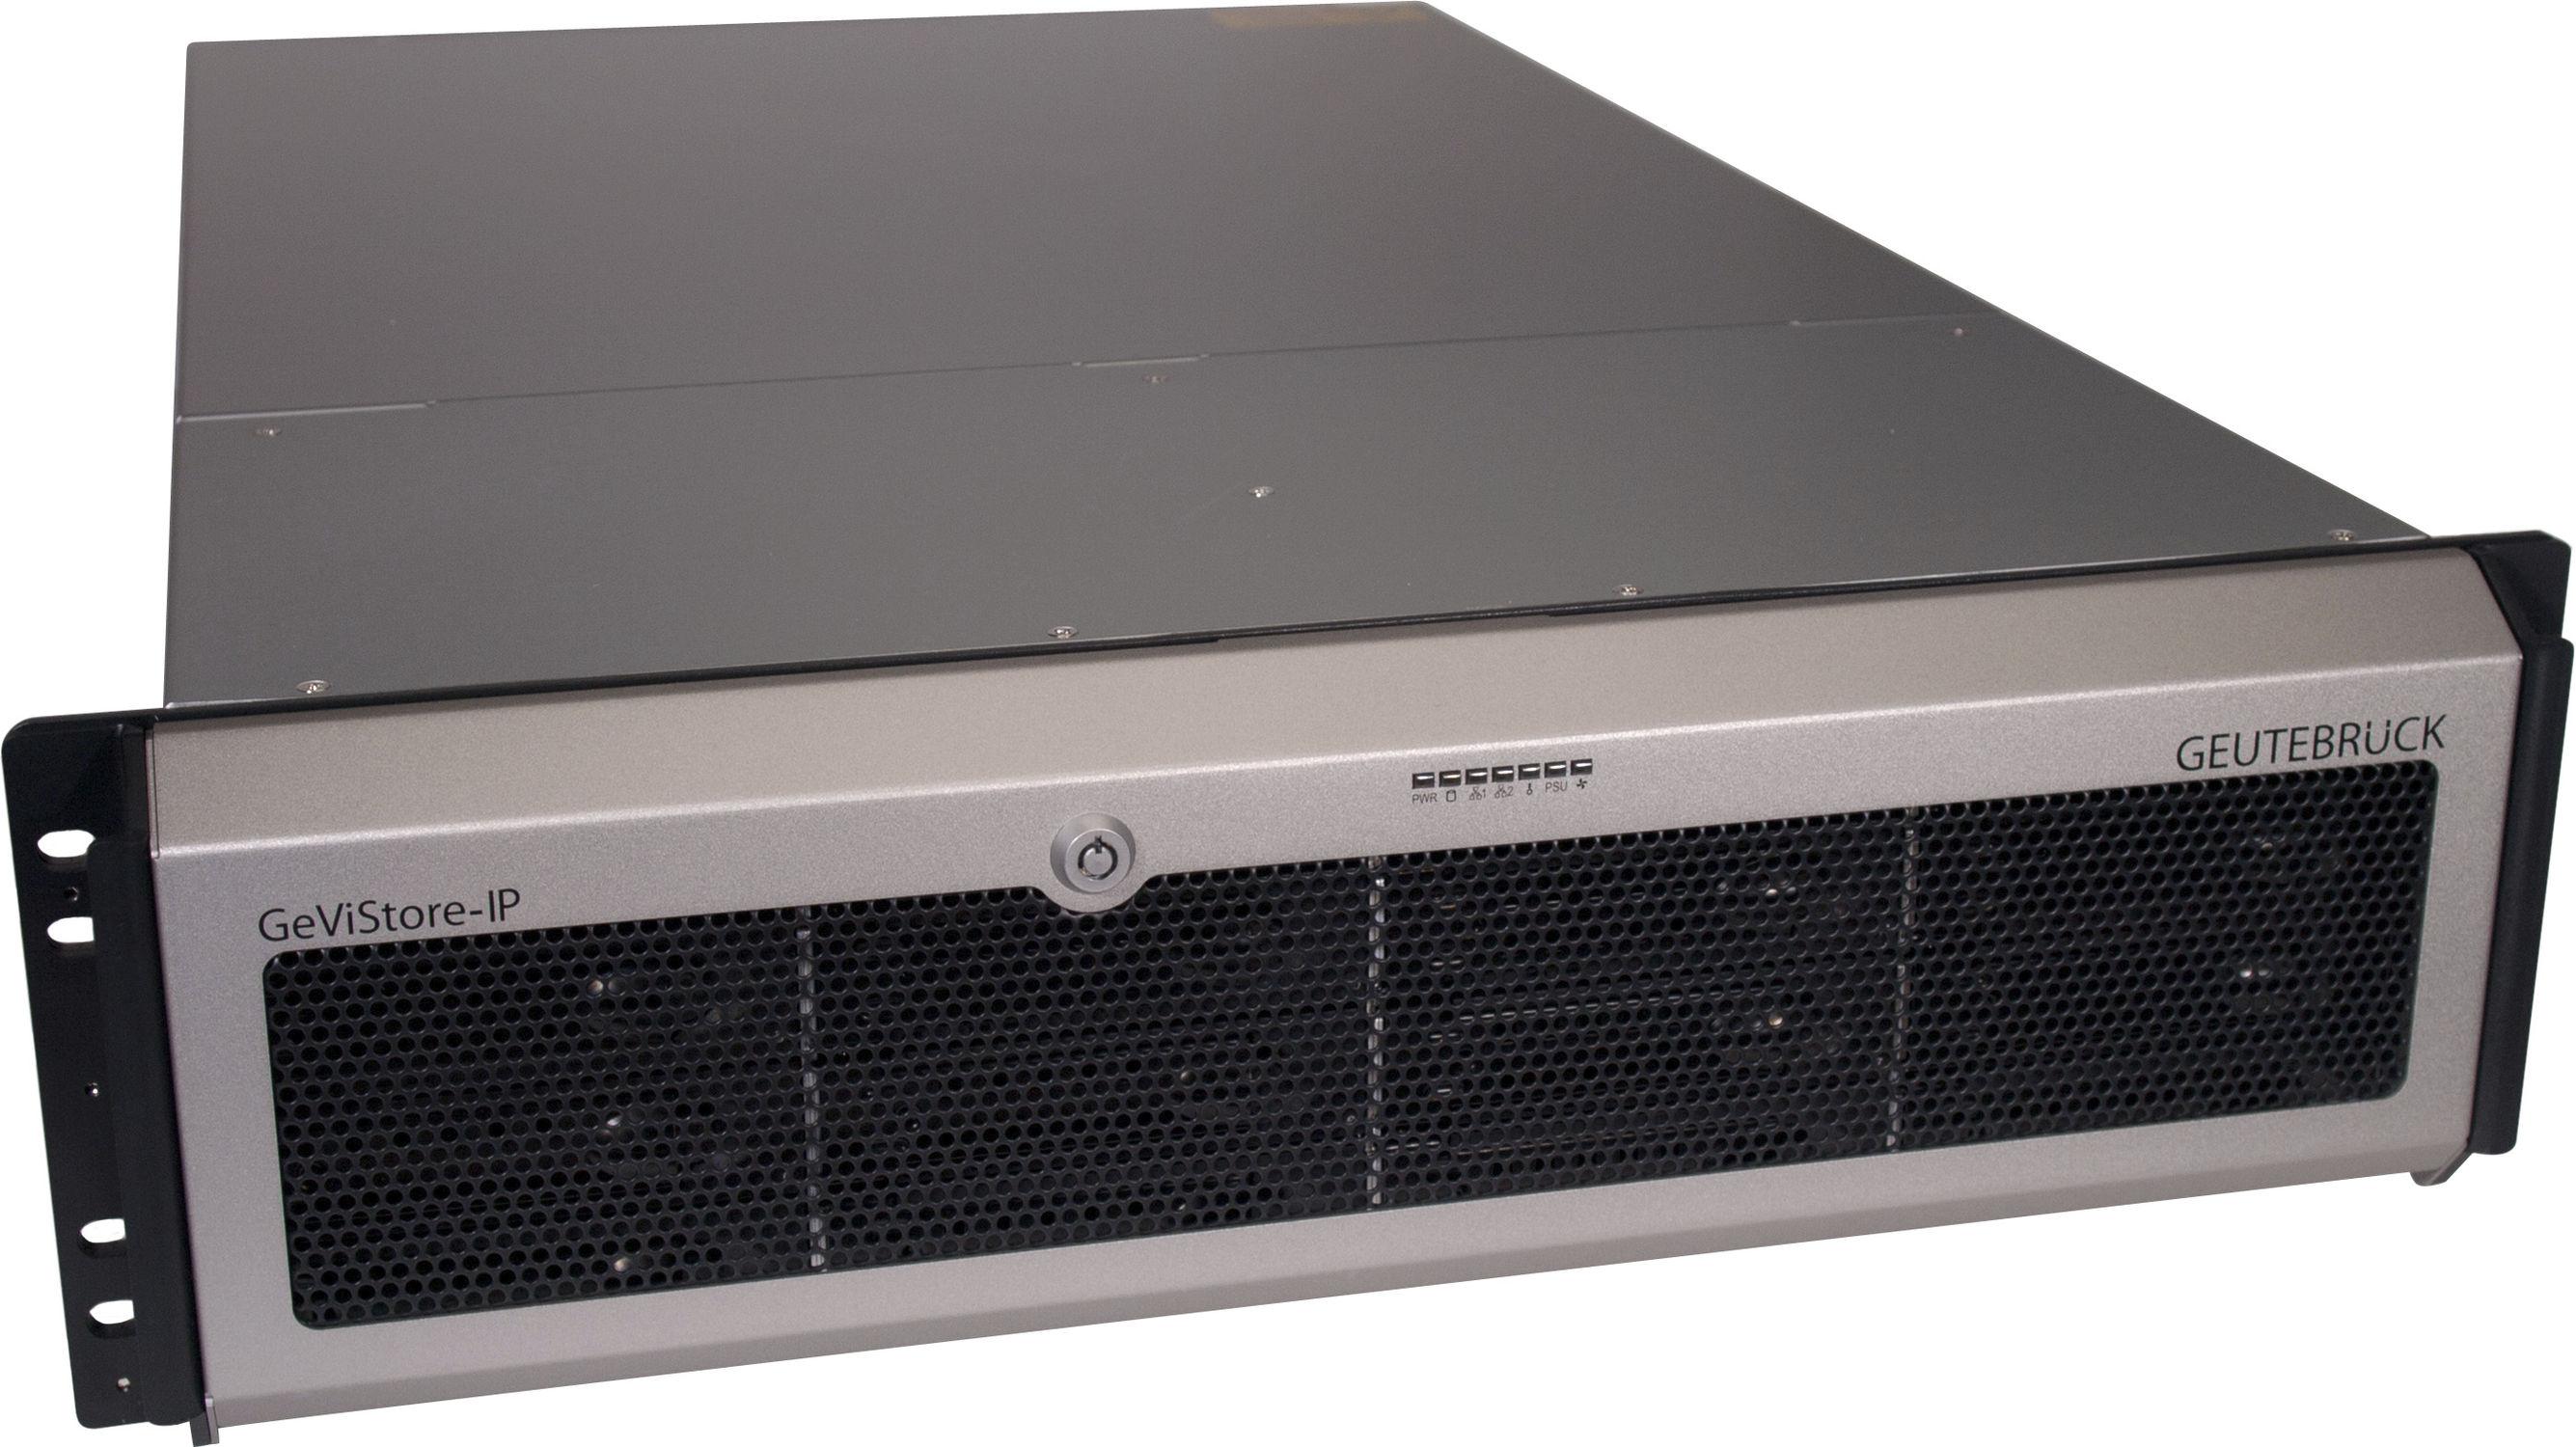 Storage server / rack-mount / Intel® Xeon - GeViStore-IP/16Bay-2P